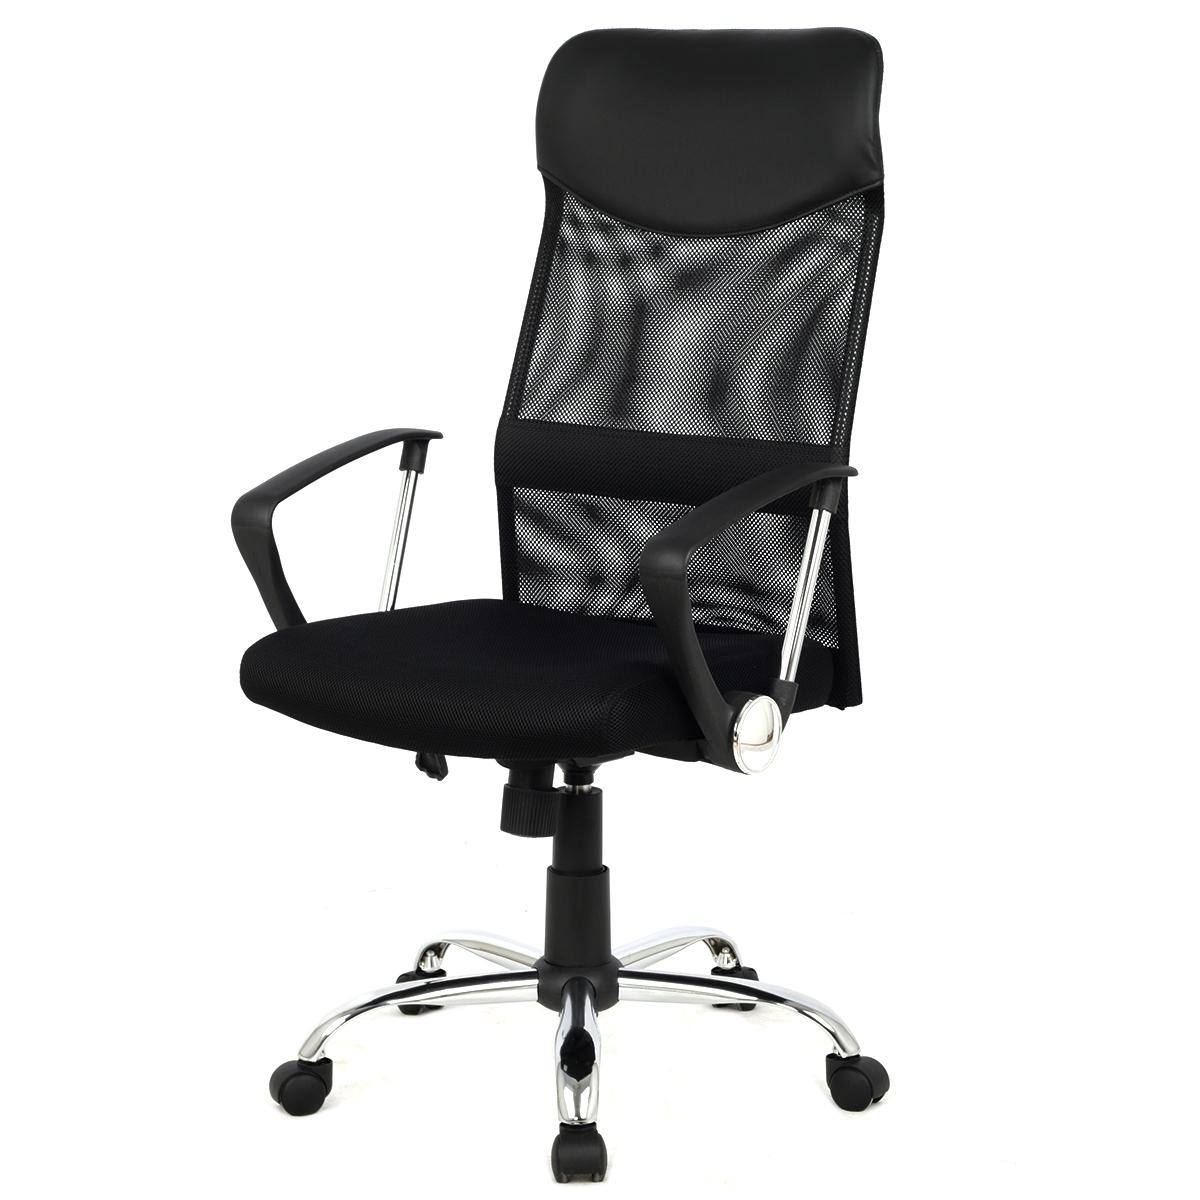 Modern Ergonomic Mesh High Back Office Chair